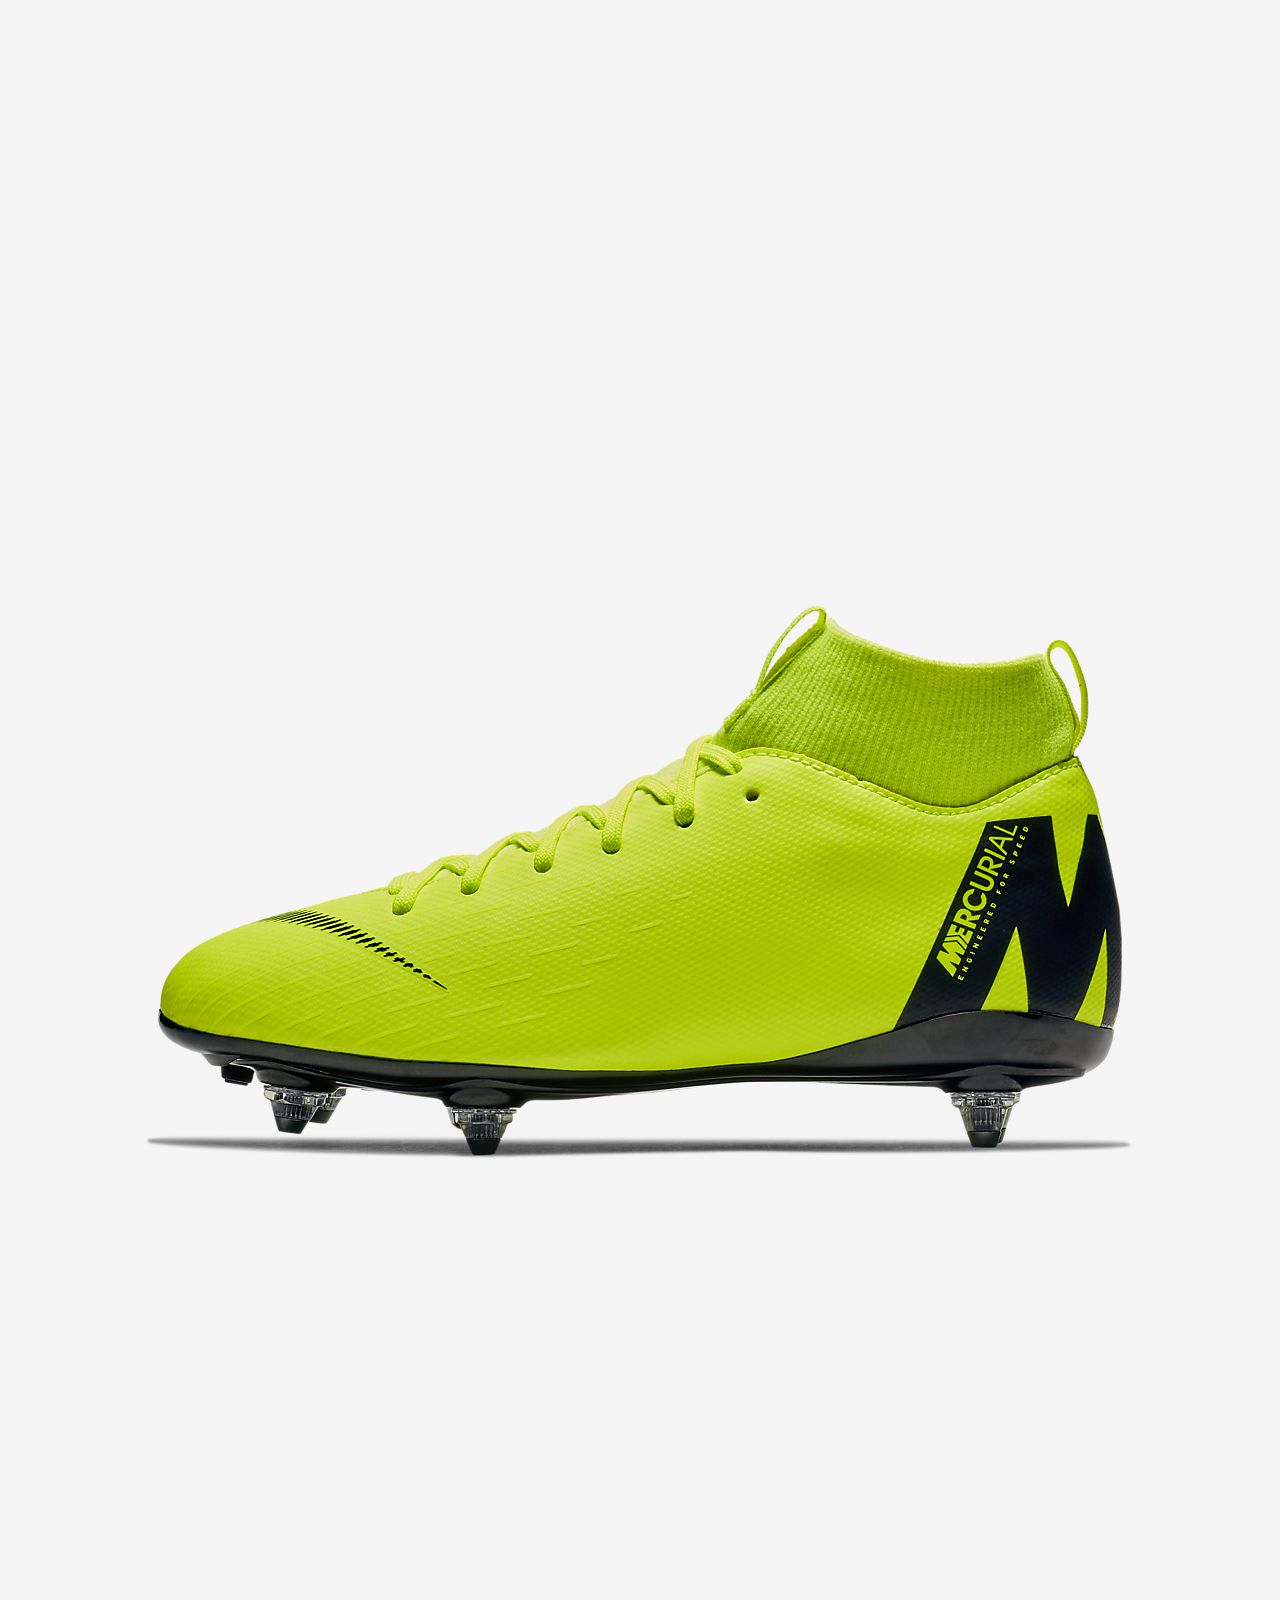 ... Kids  Soft-Ground Football Boot. Nike Jr. Mercurial Superfly VI Academy  SG-PRO 586de553684d